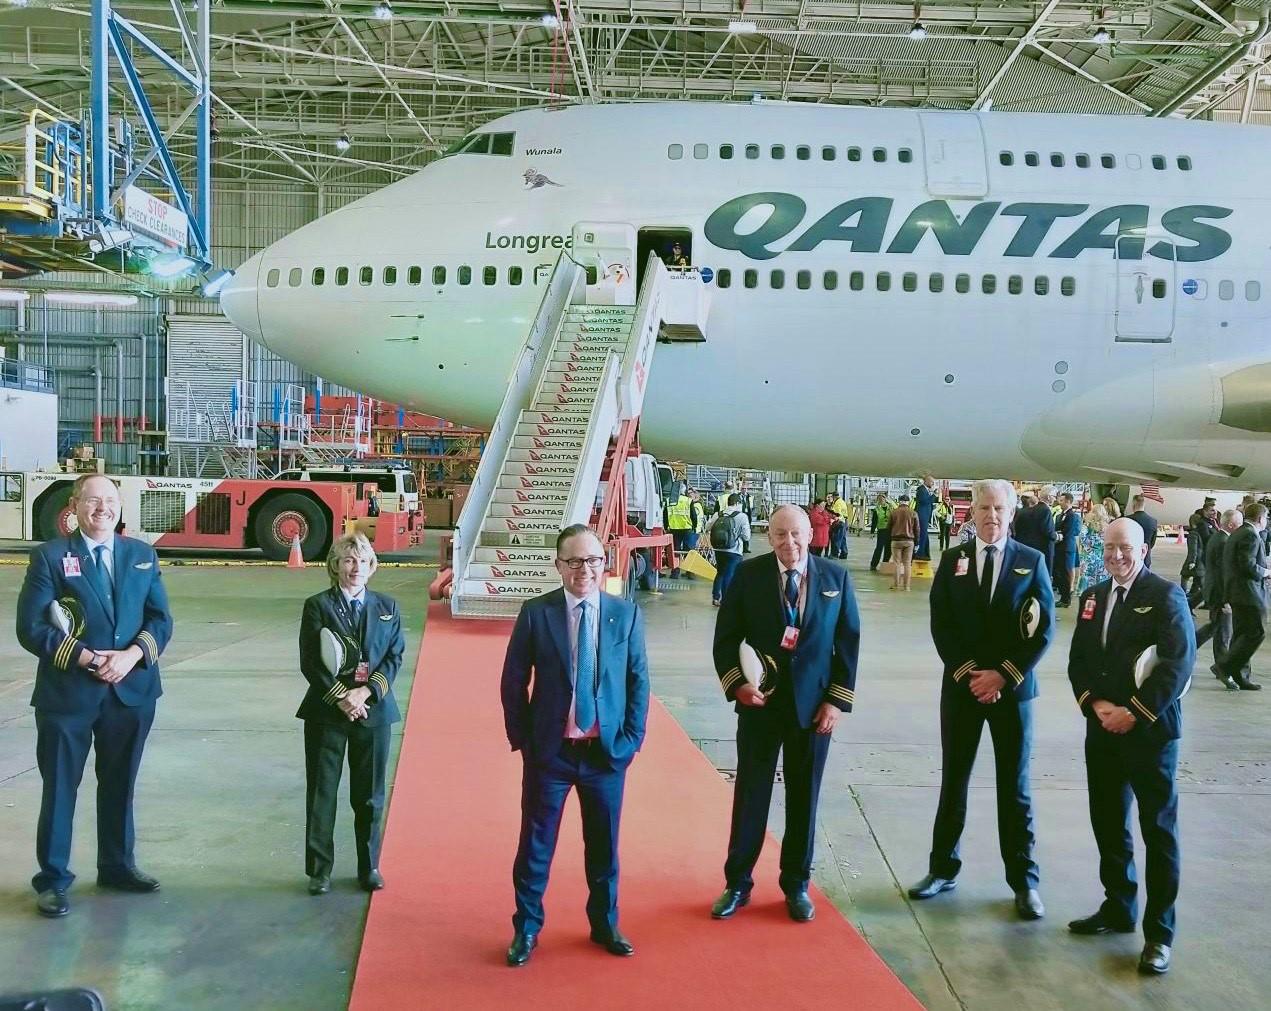 Last Qantas 747 jet says goodbye with 'flying kangaroo' in sky